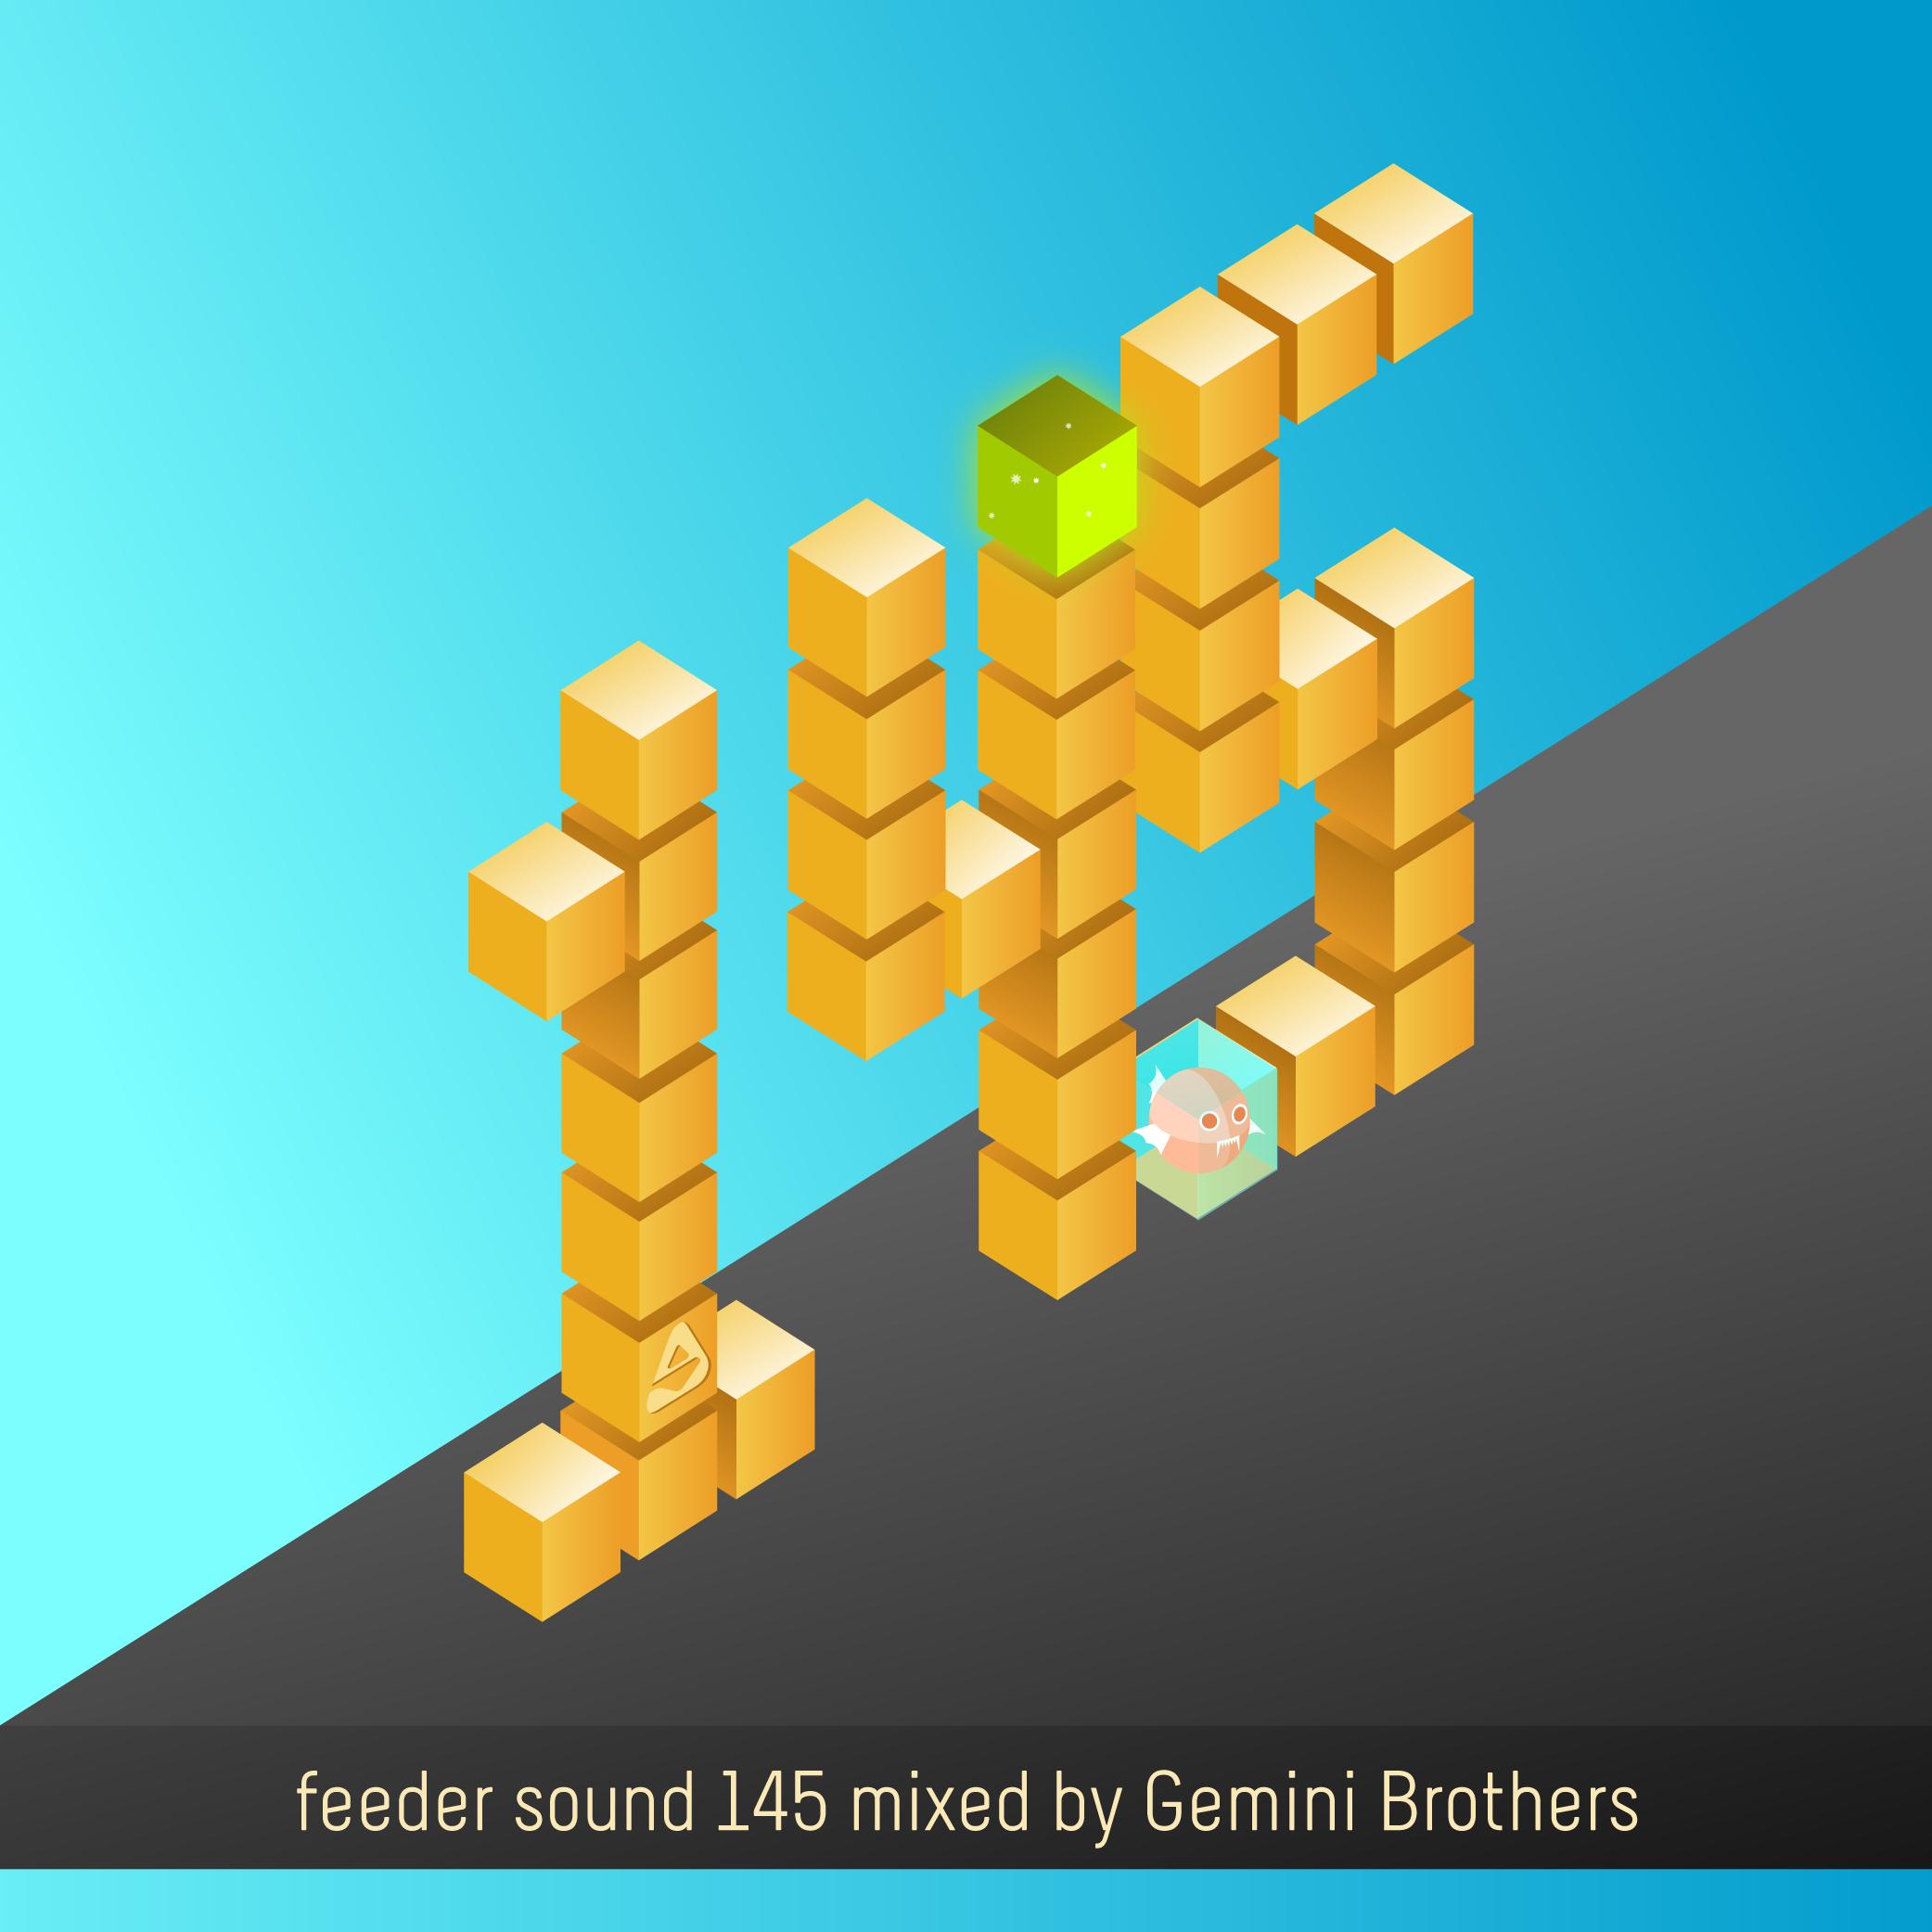 feeder sound 145 Gemini Brothers